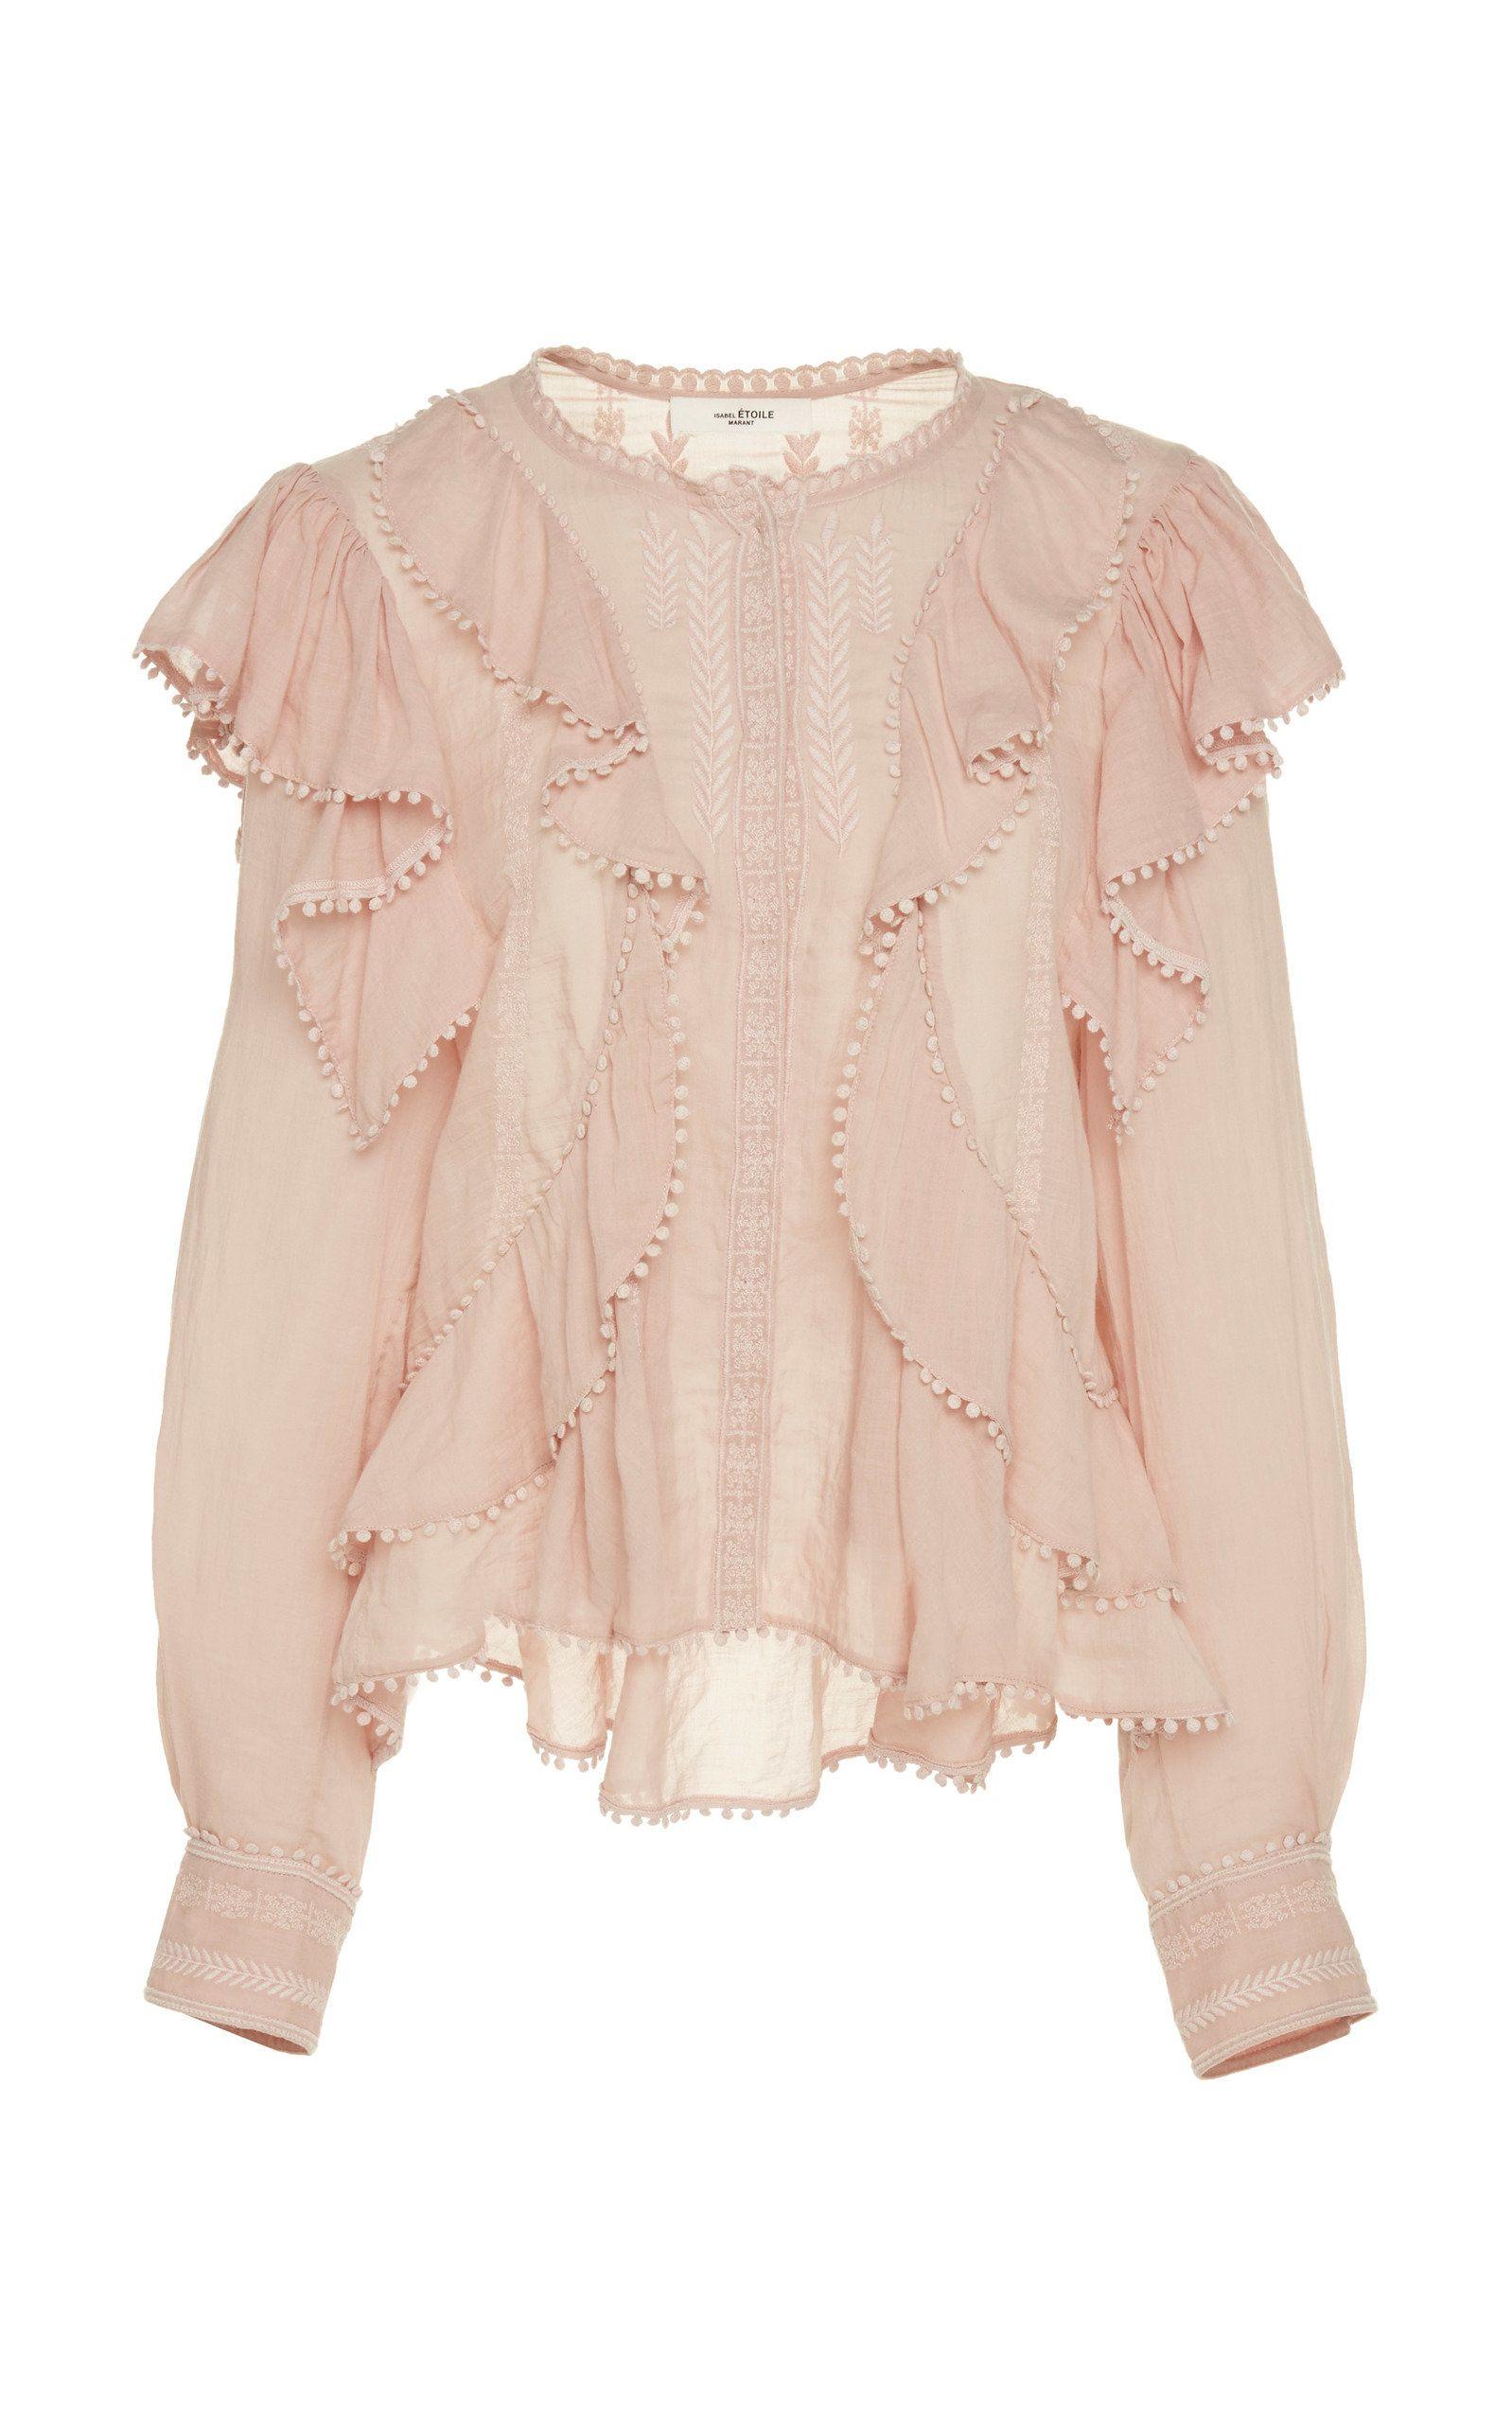 37d58d5d74421 Alea Vintage Lace Top by ISABEL MARANT ÉTOILE for Preorder on Moda Operandi